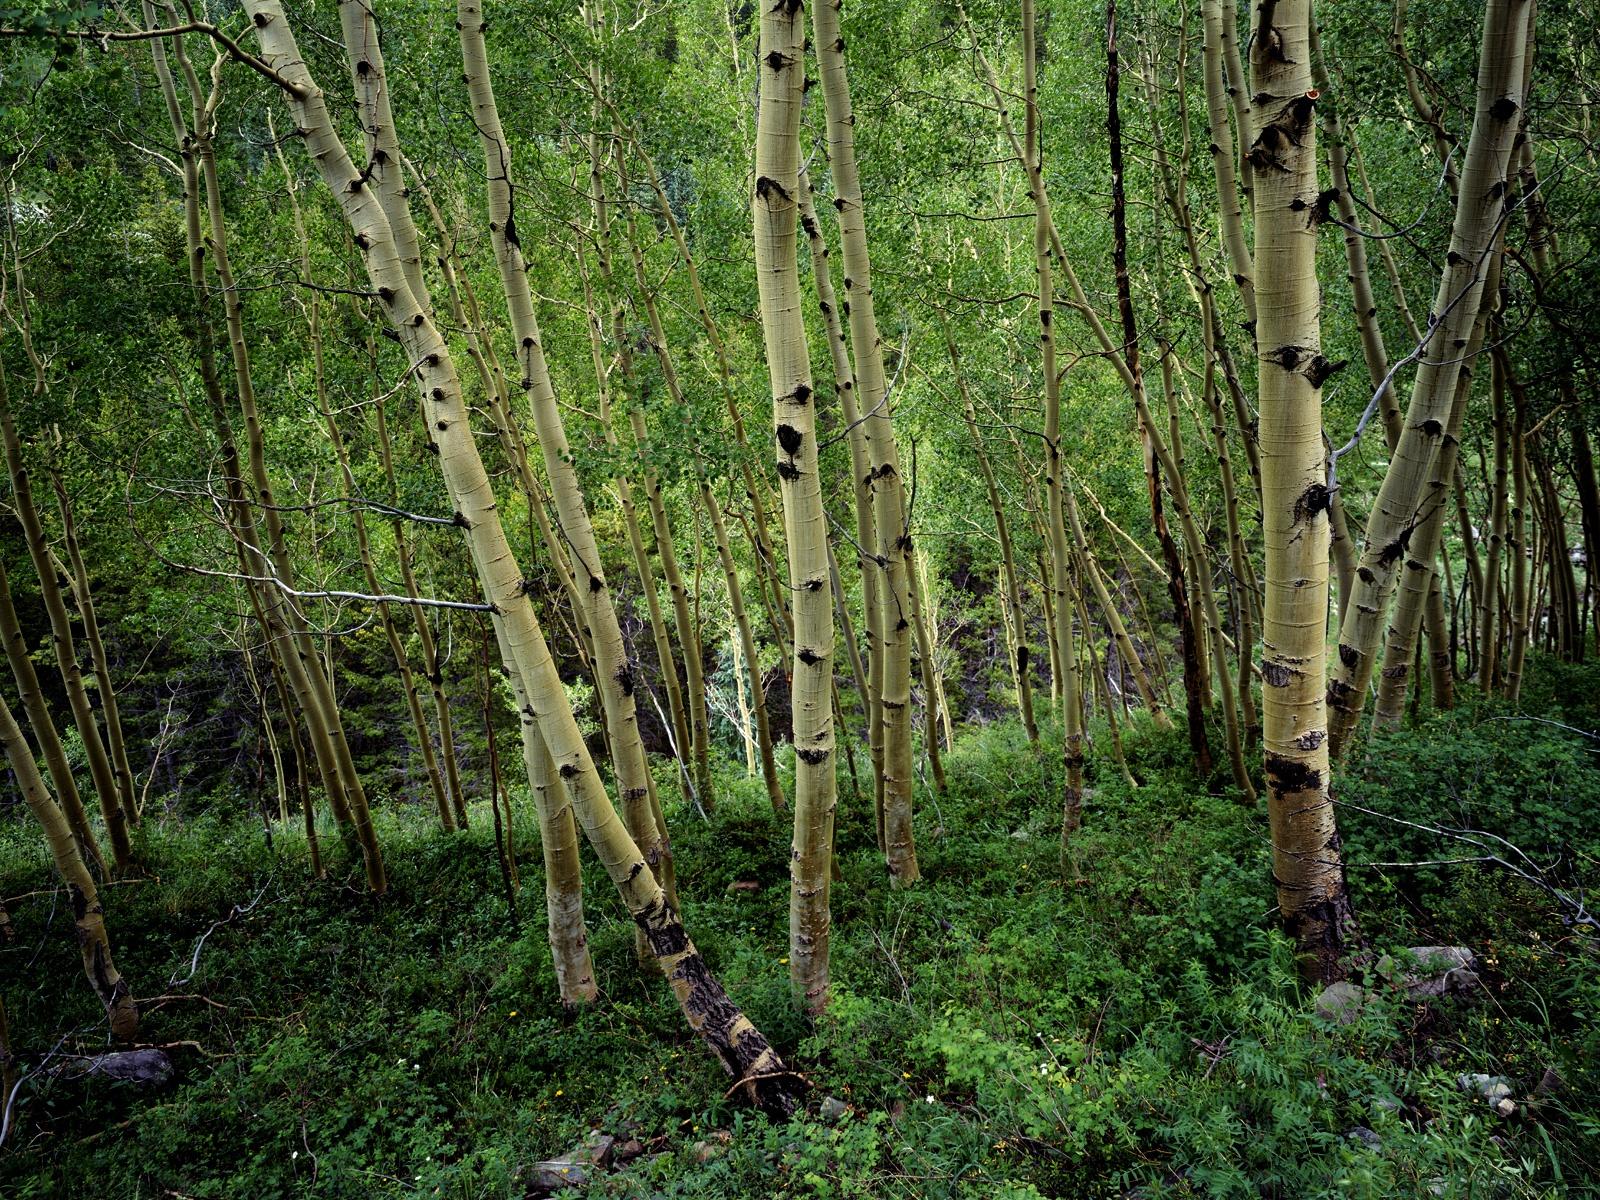 Wallpaper With Birch Trees Wallpapersafari